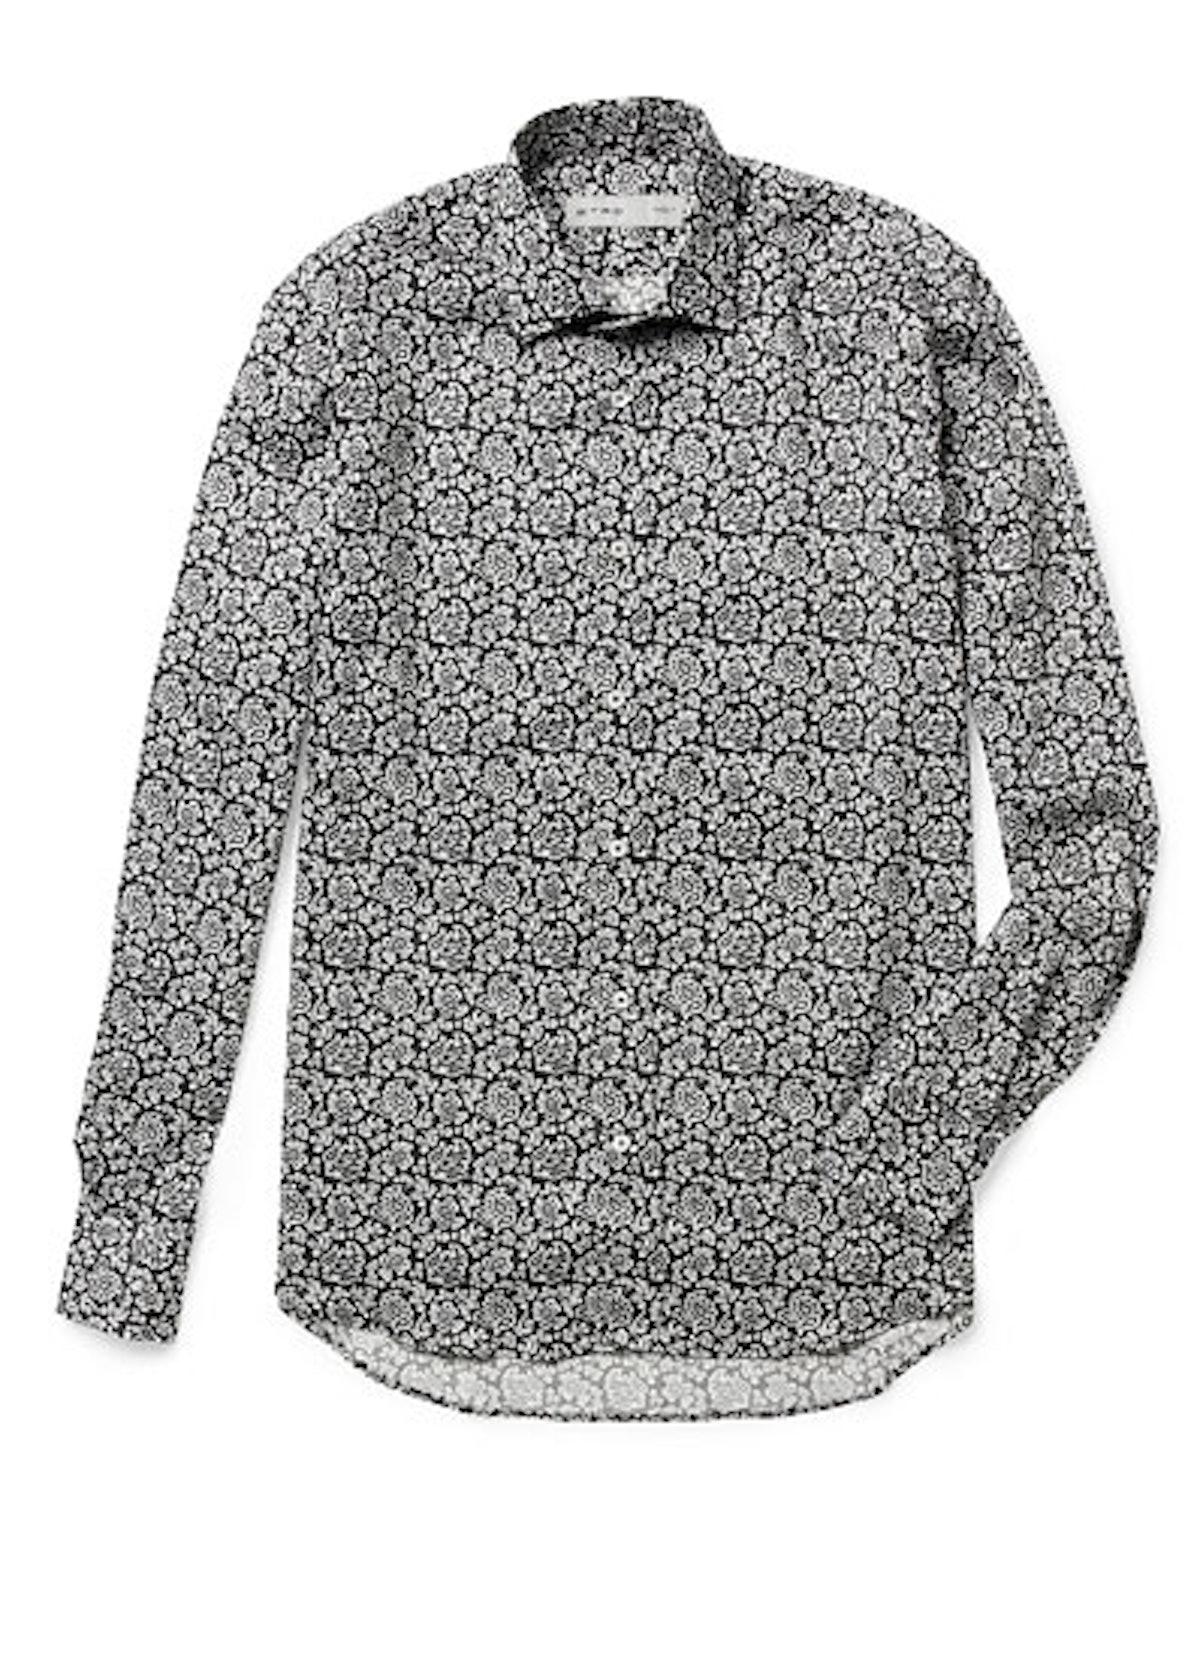 fass-pitchfork-fashion-06-v.jpg